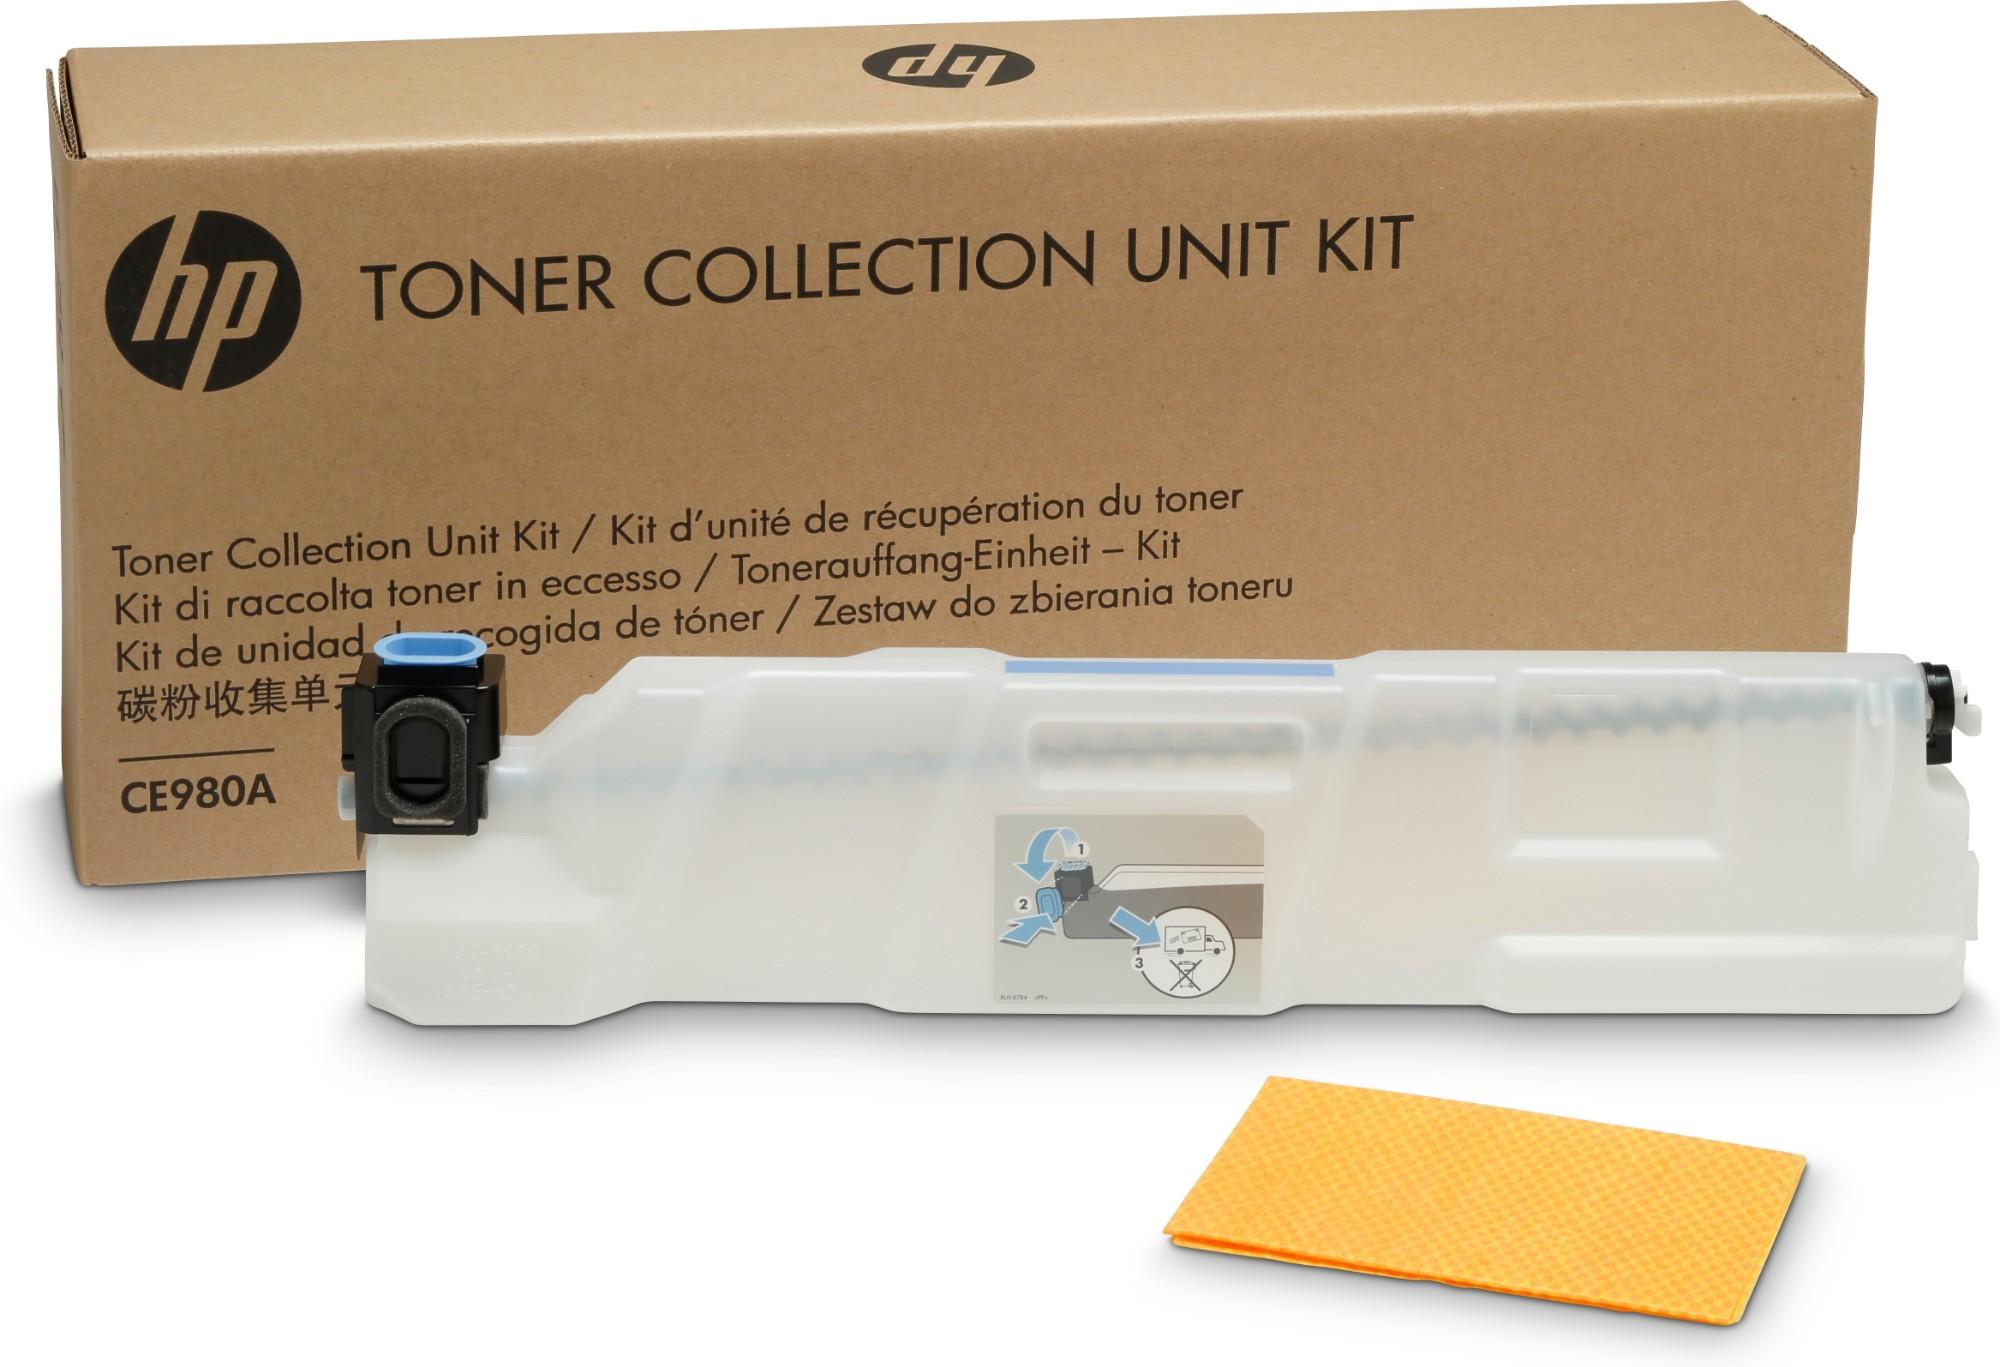 HP CE980A toner collector 150000 pagina's